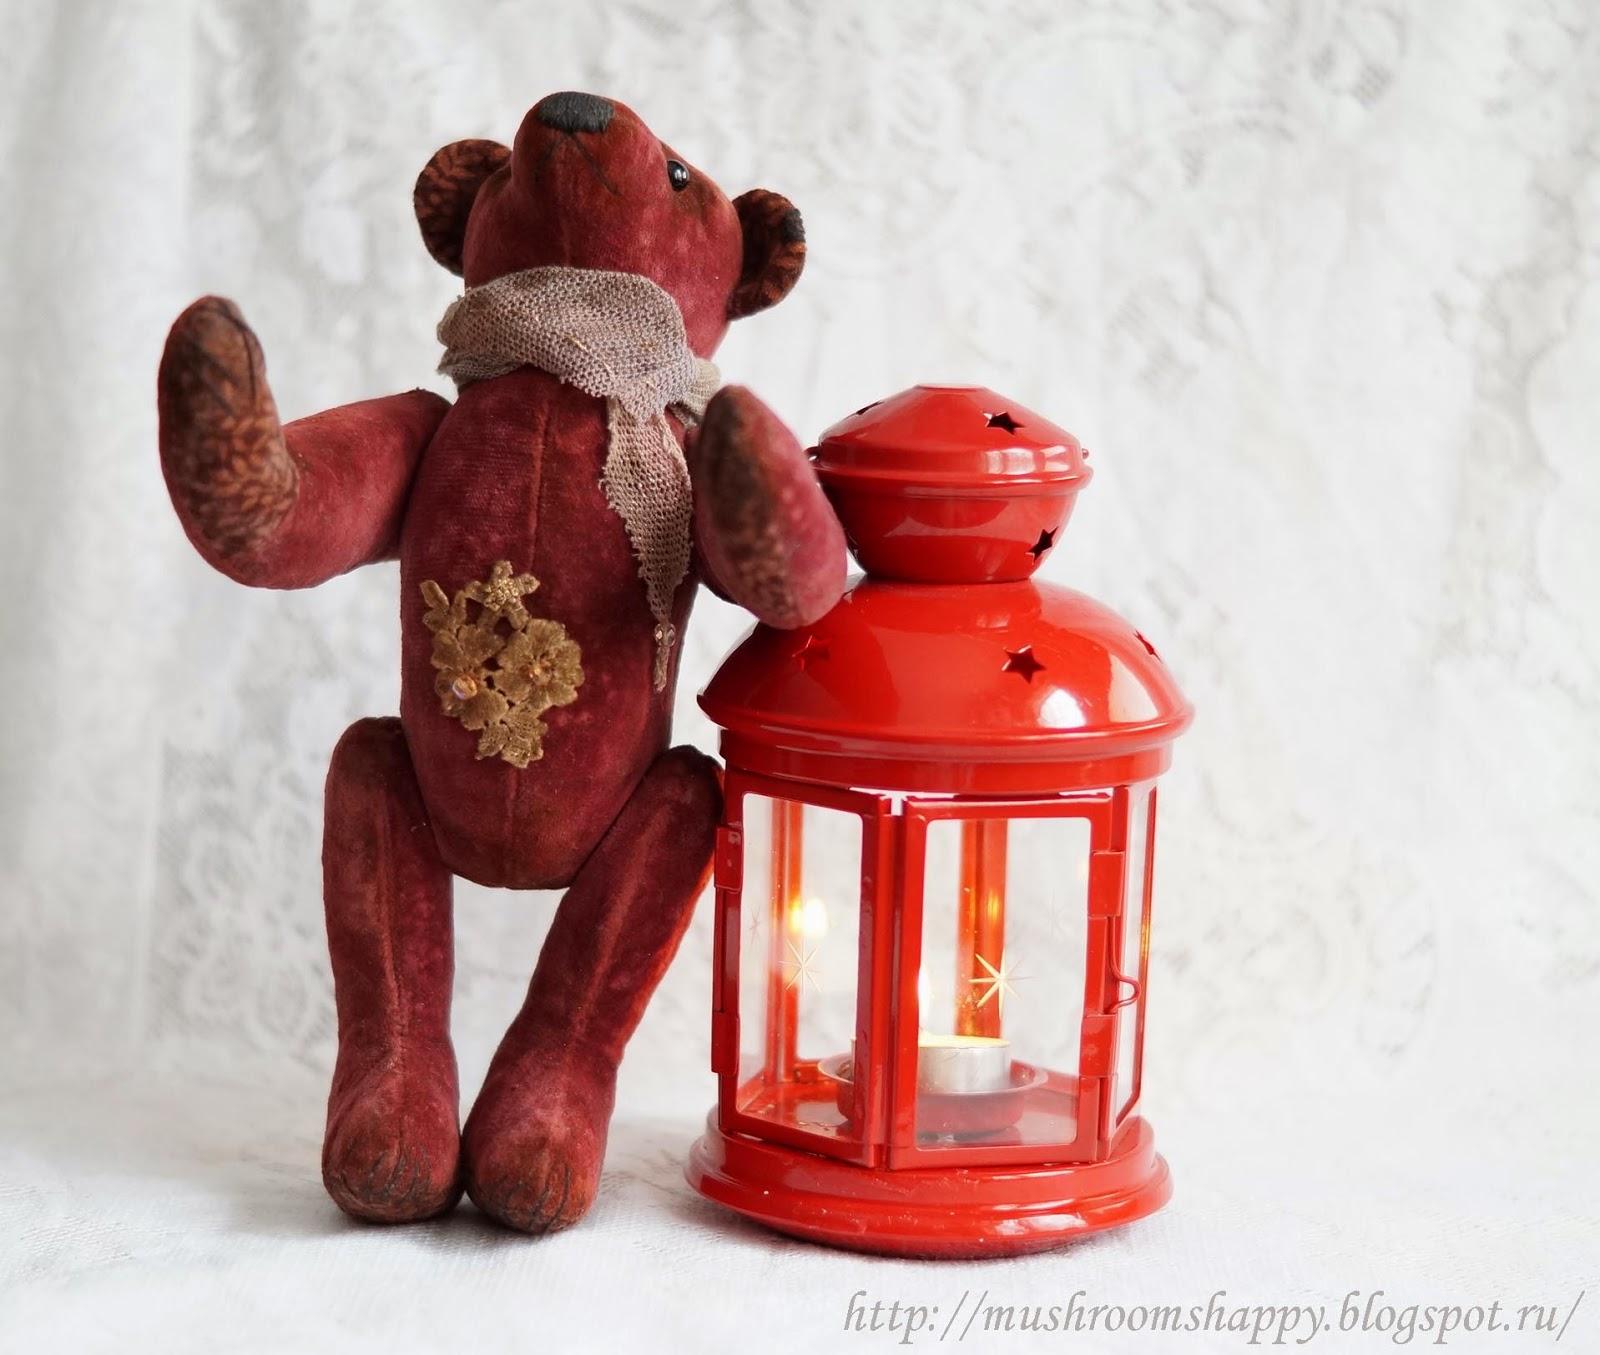 Teddybear Goracio